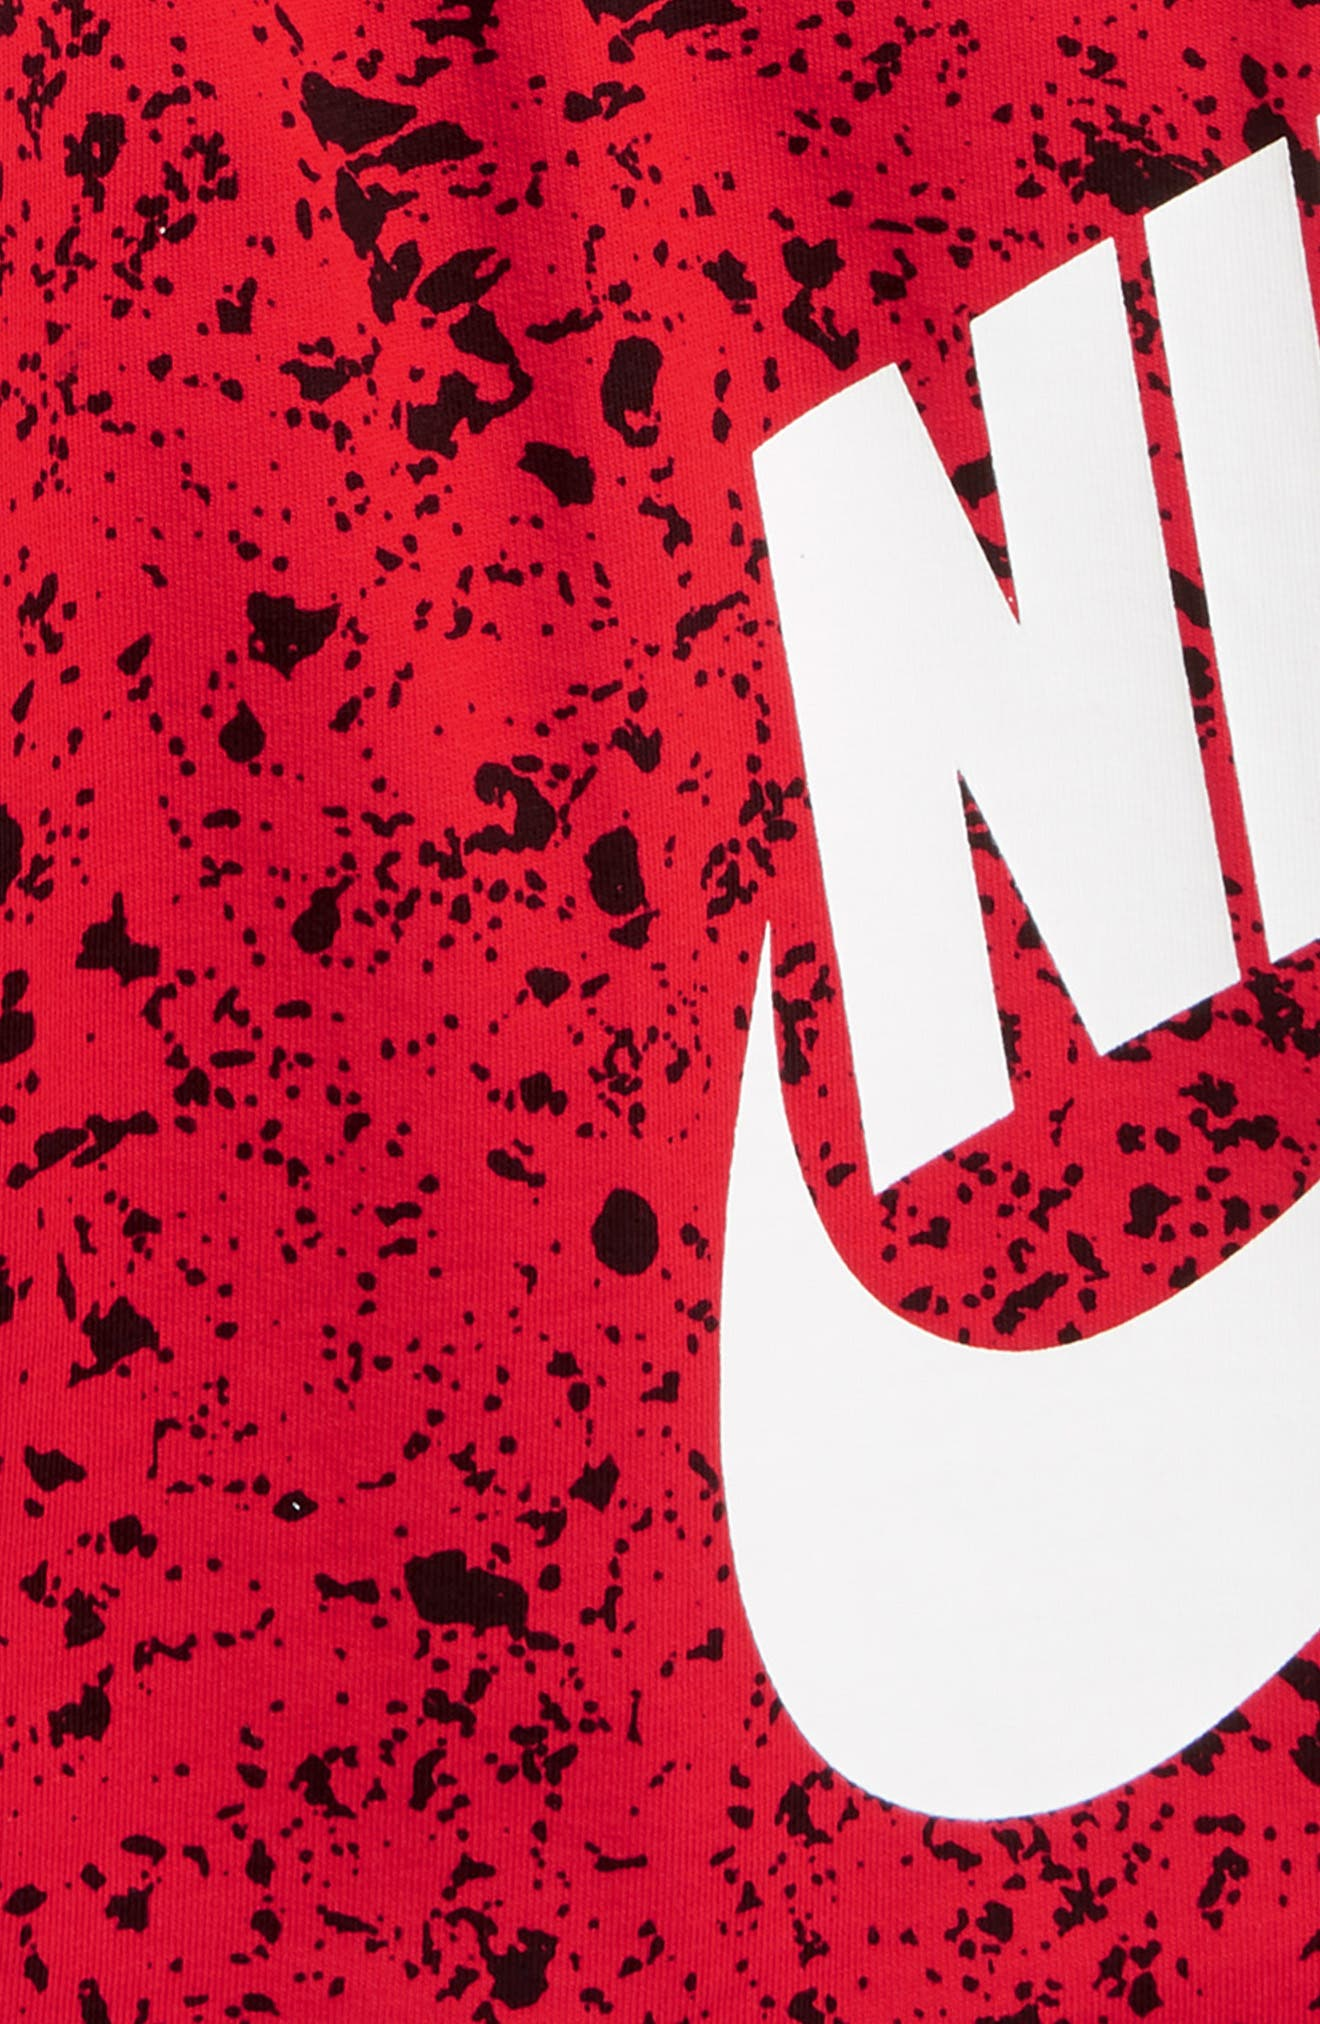 Sportswear Alumni Shorts,                             Alternate thumbnail 8, color,